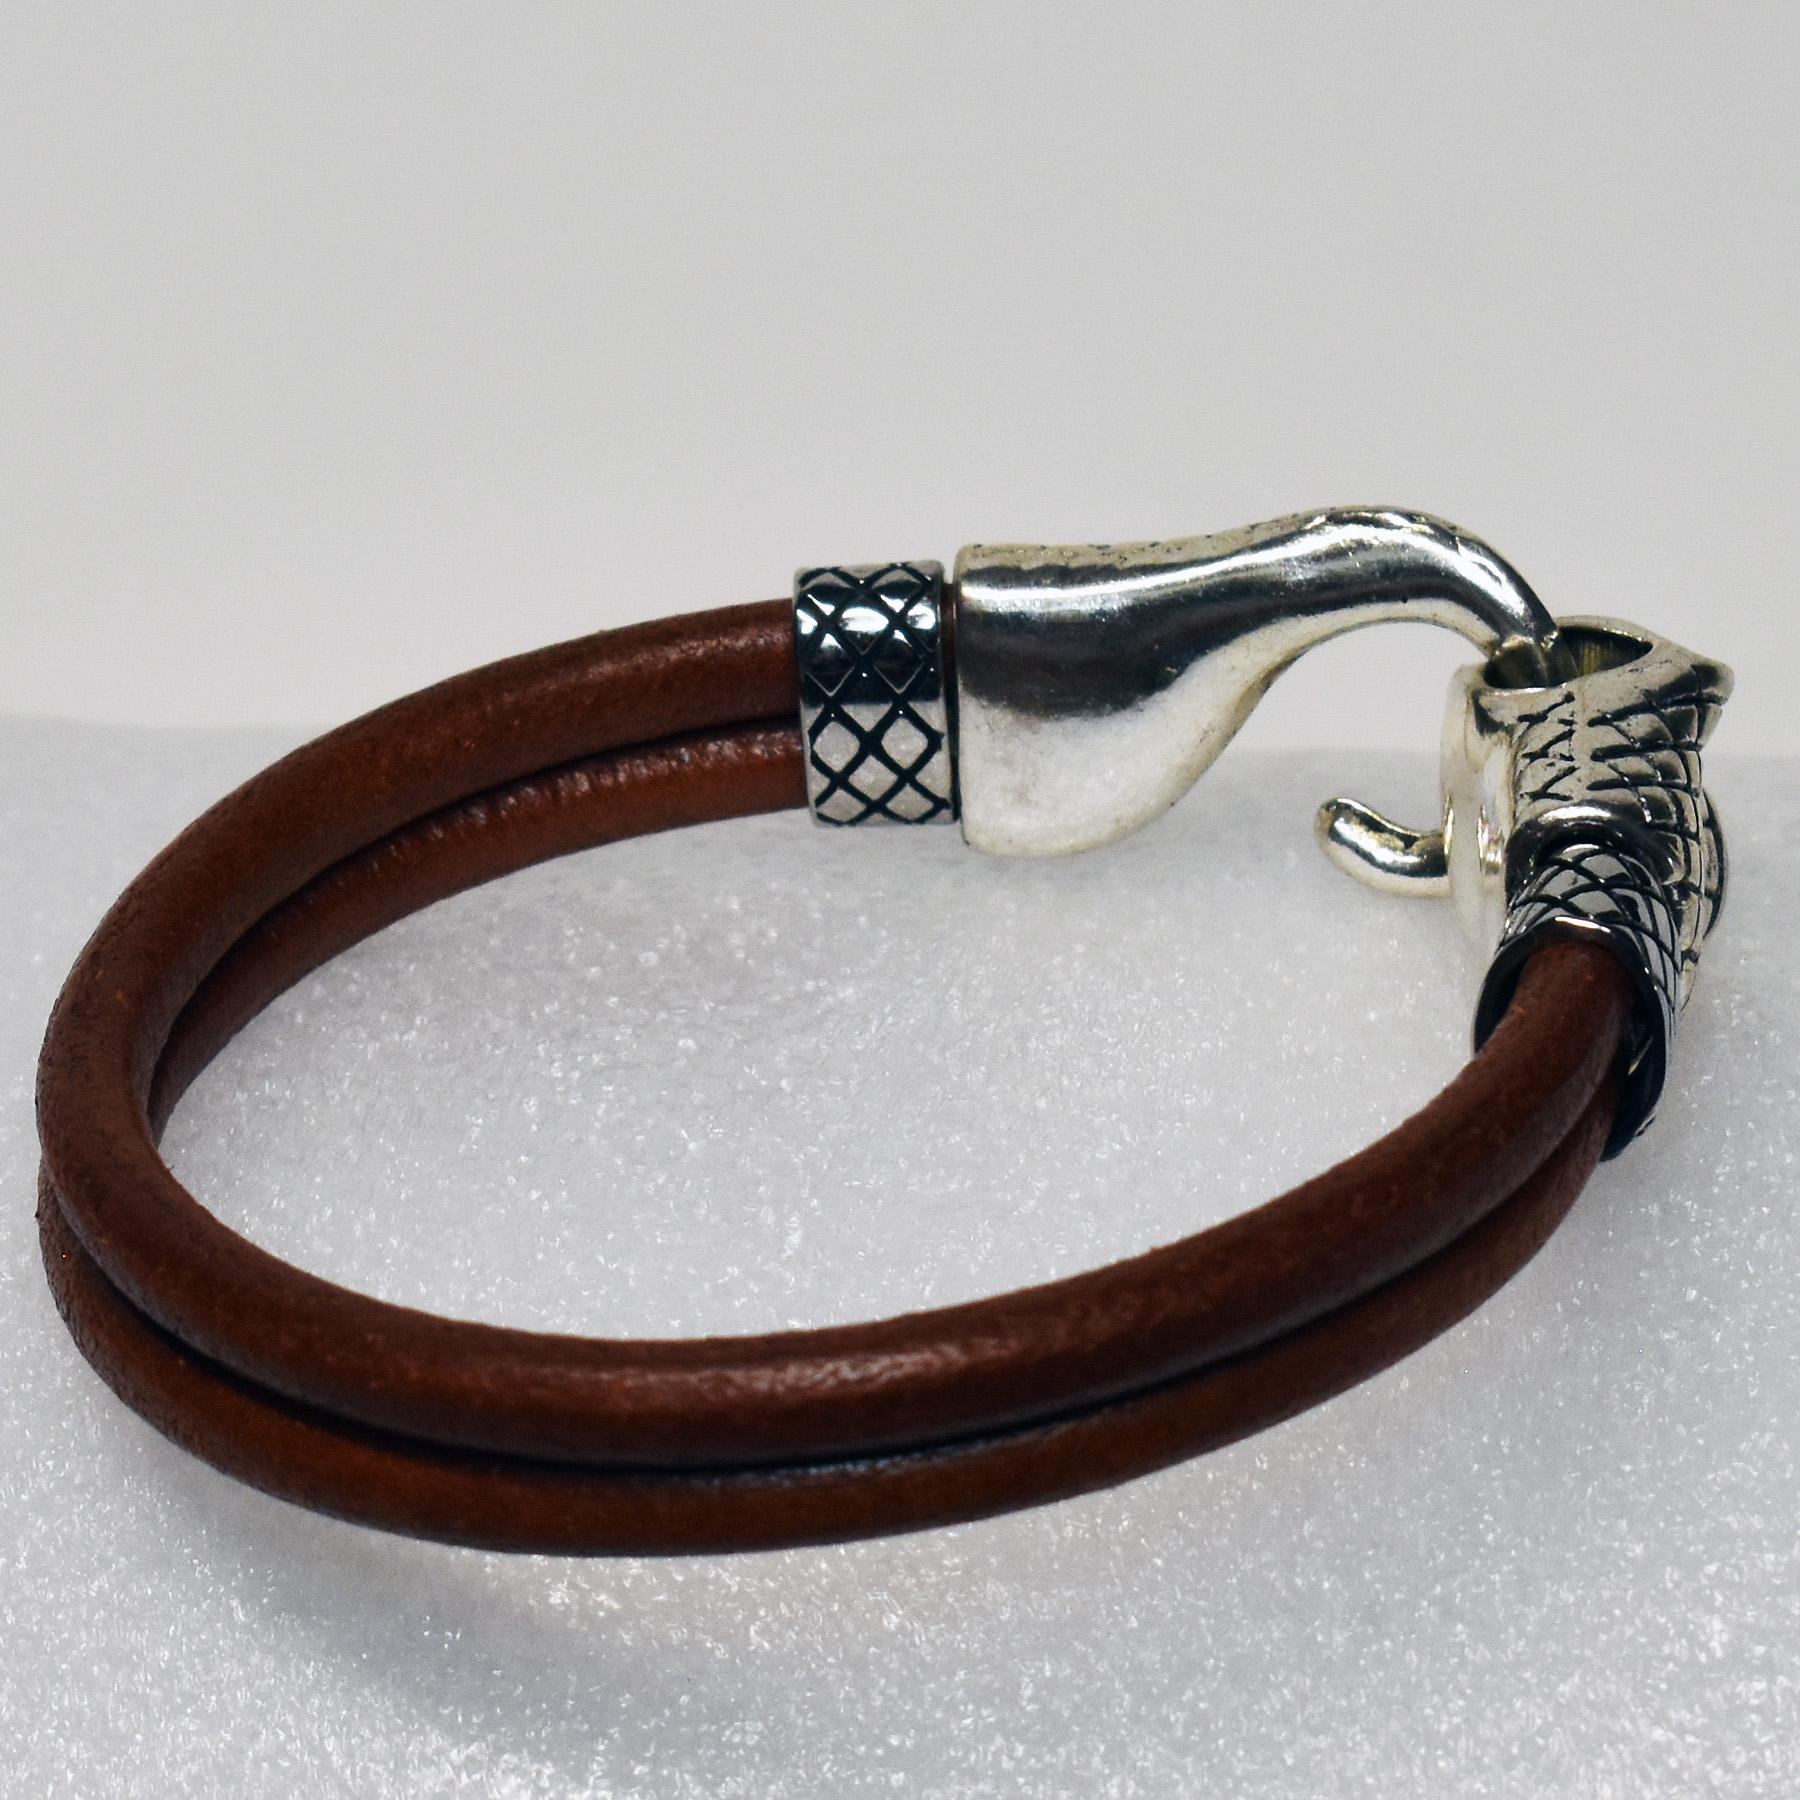 JekylsHydes_Bracelets__0010_003B